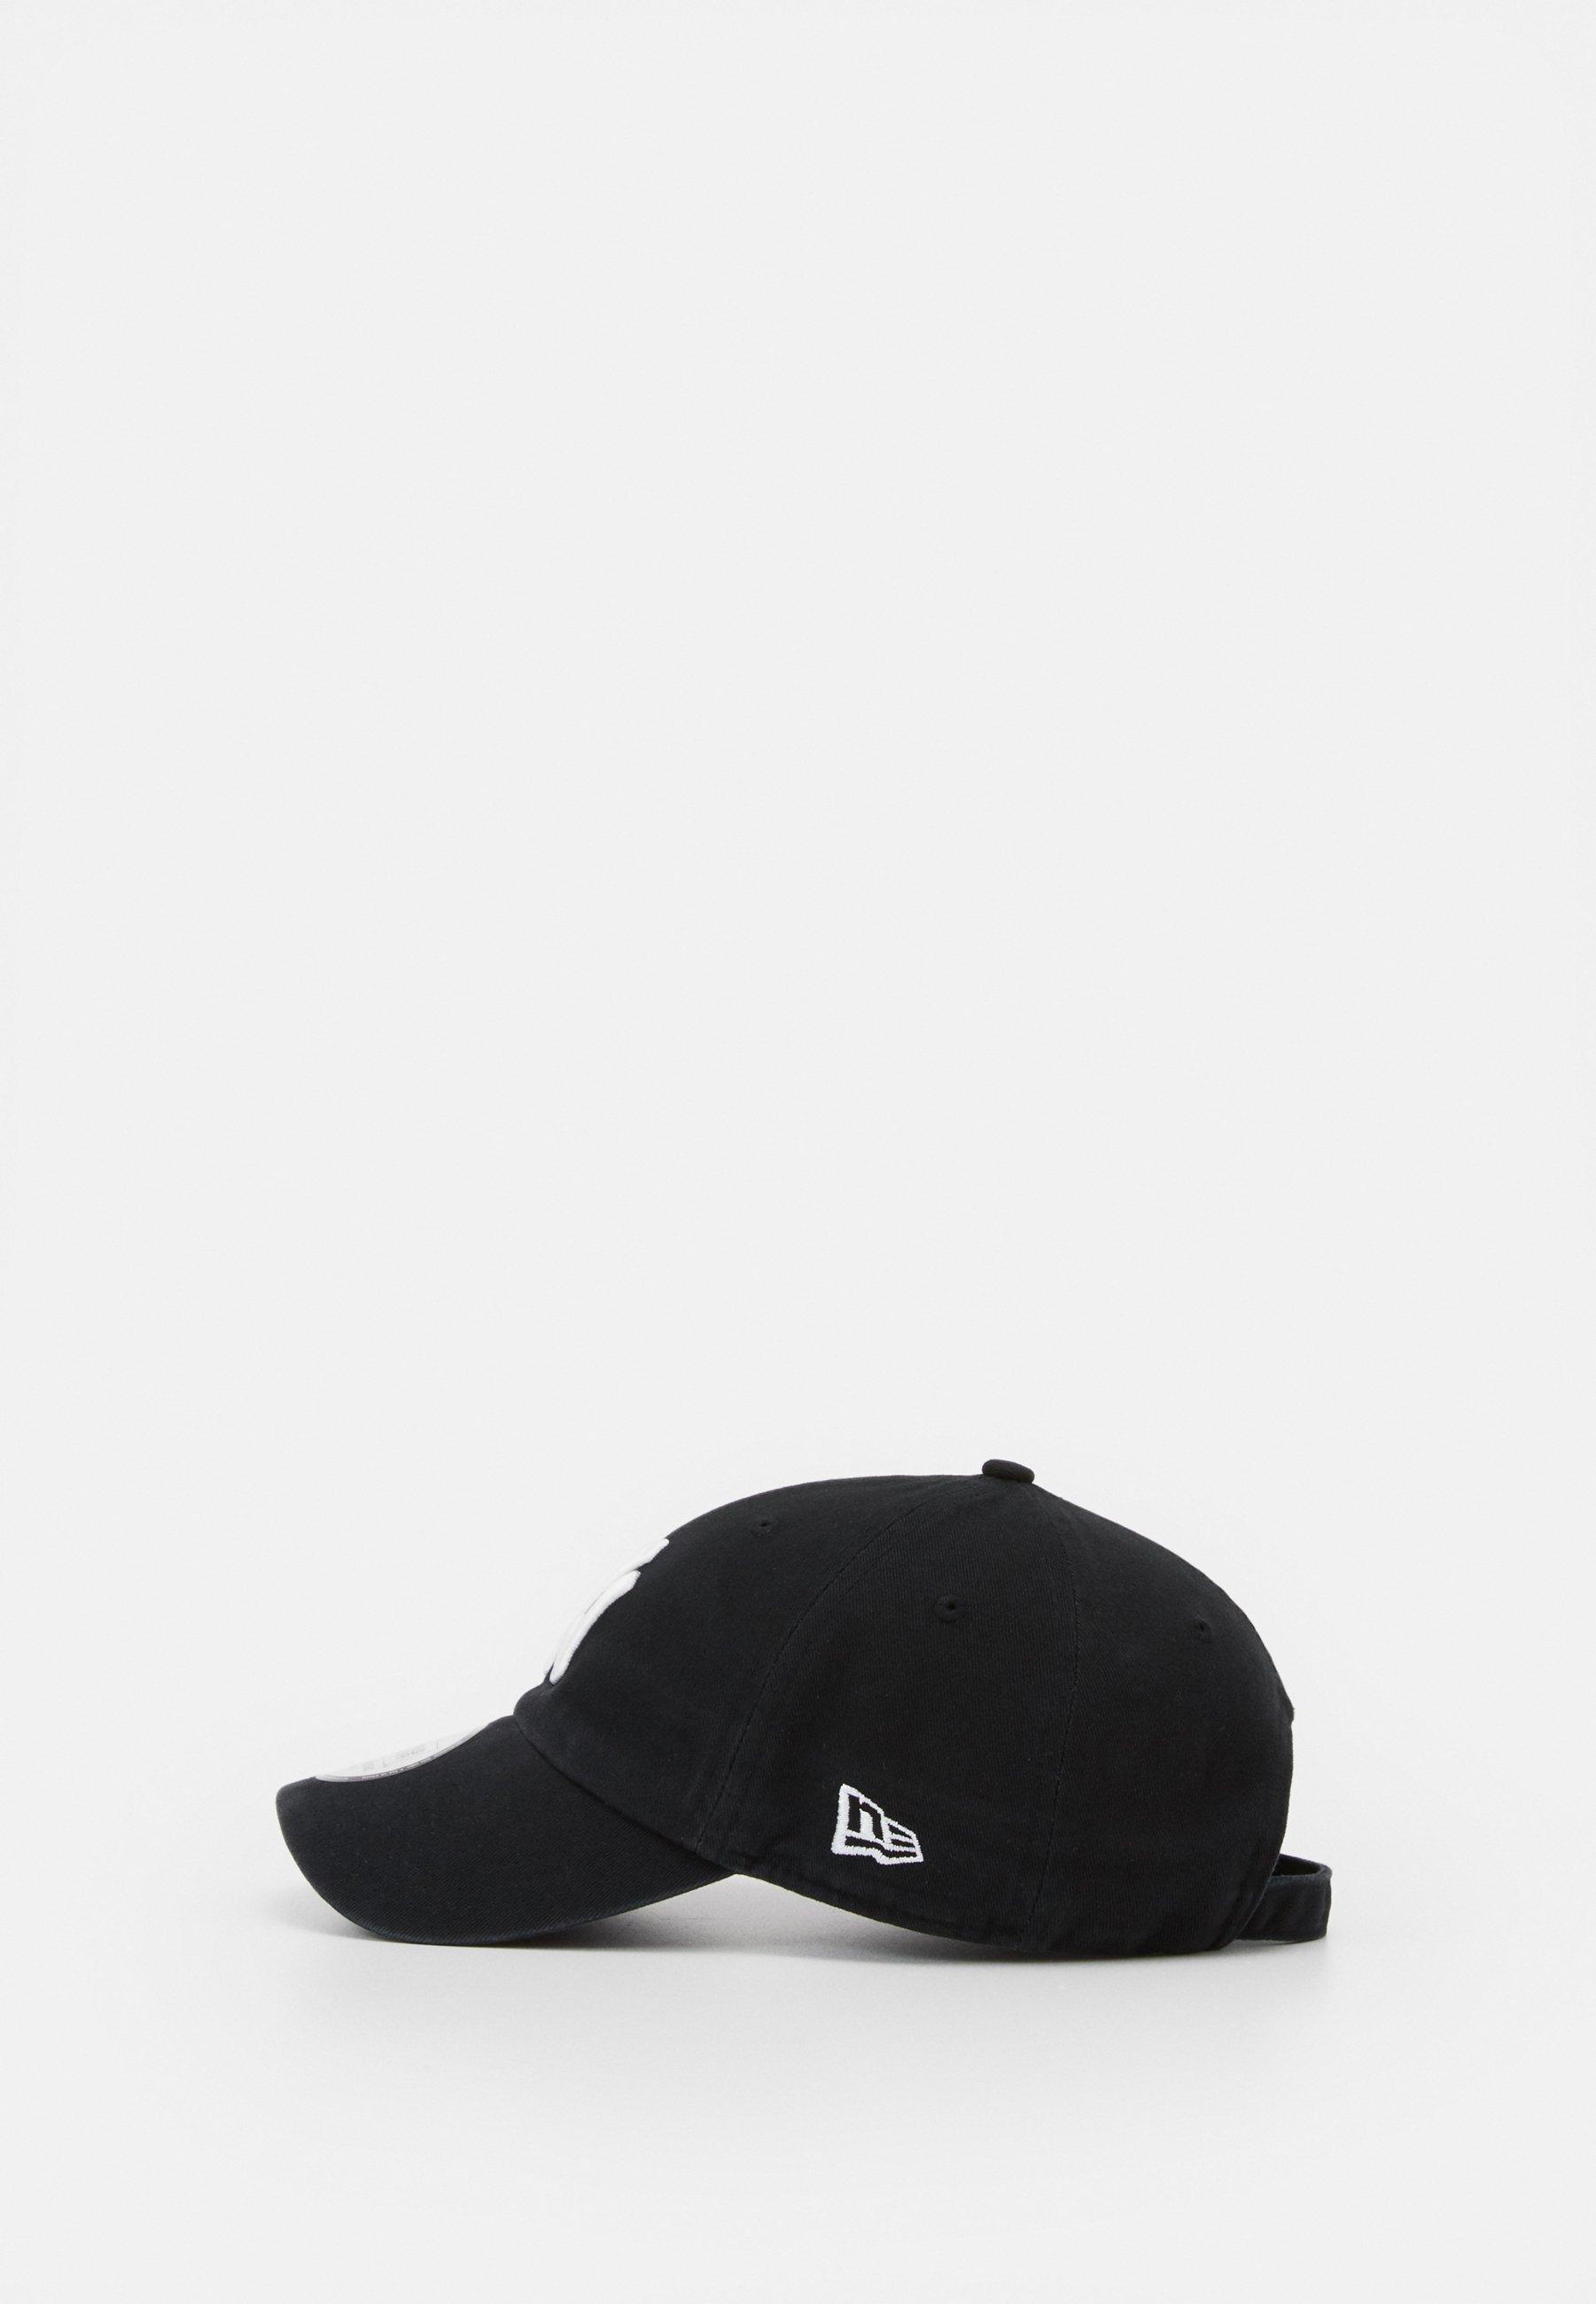 New Era League Essential Casual Classic - Cap Black/white/schwarz